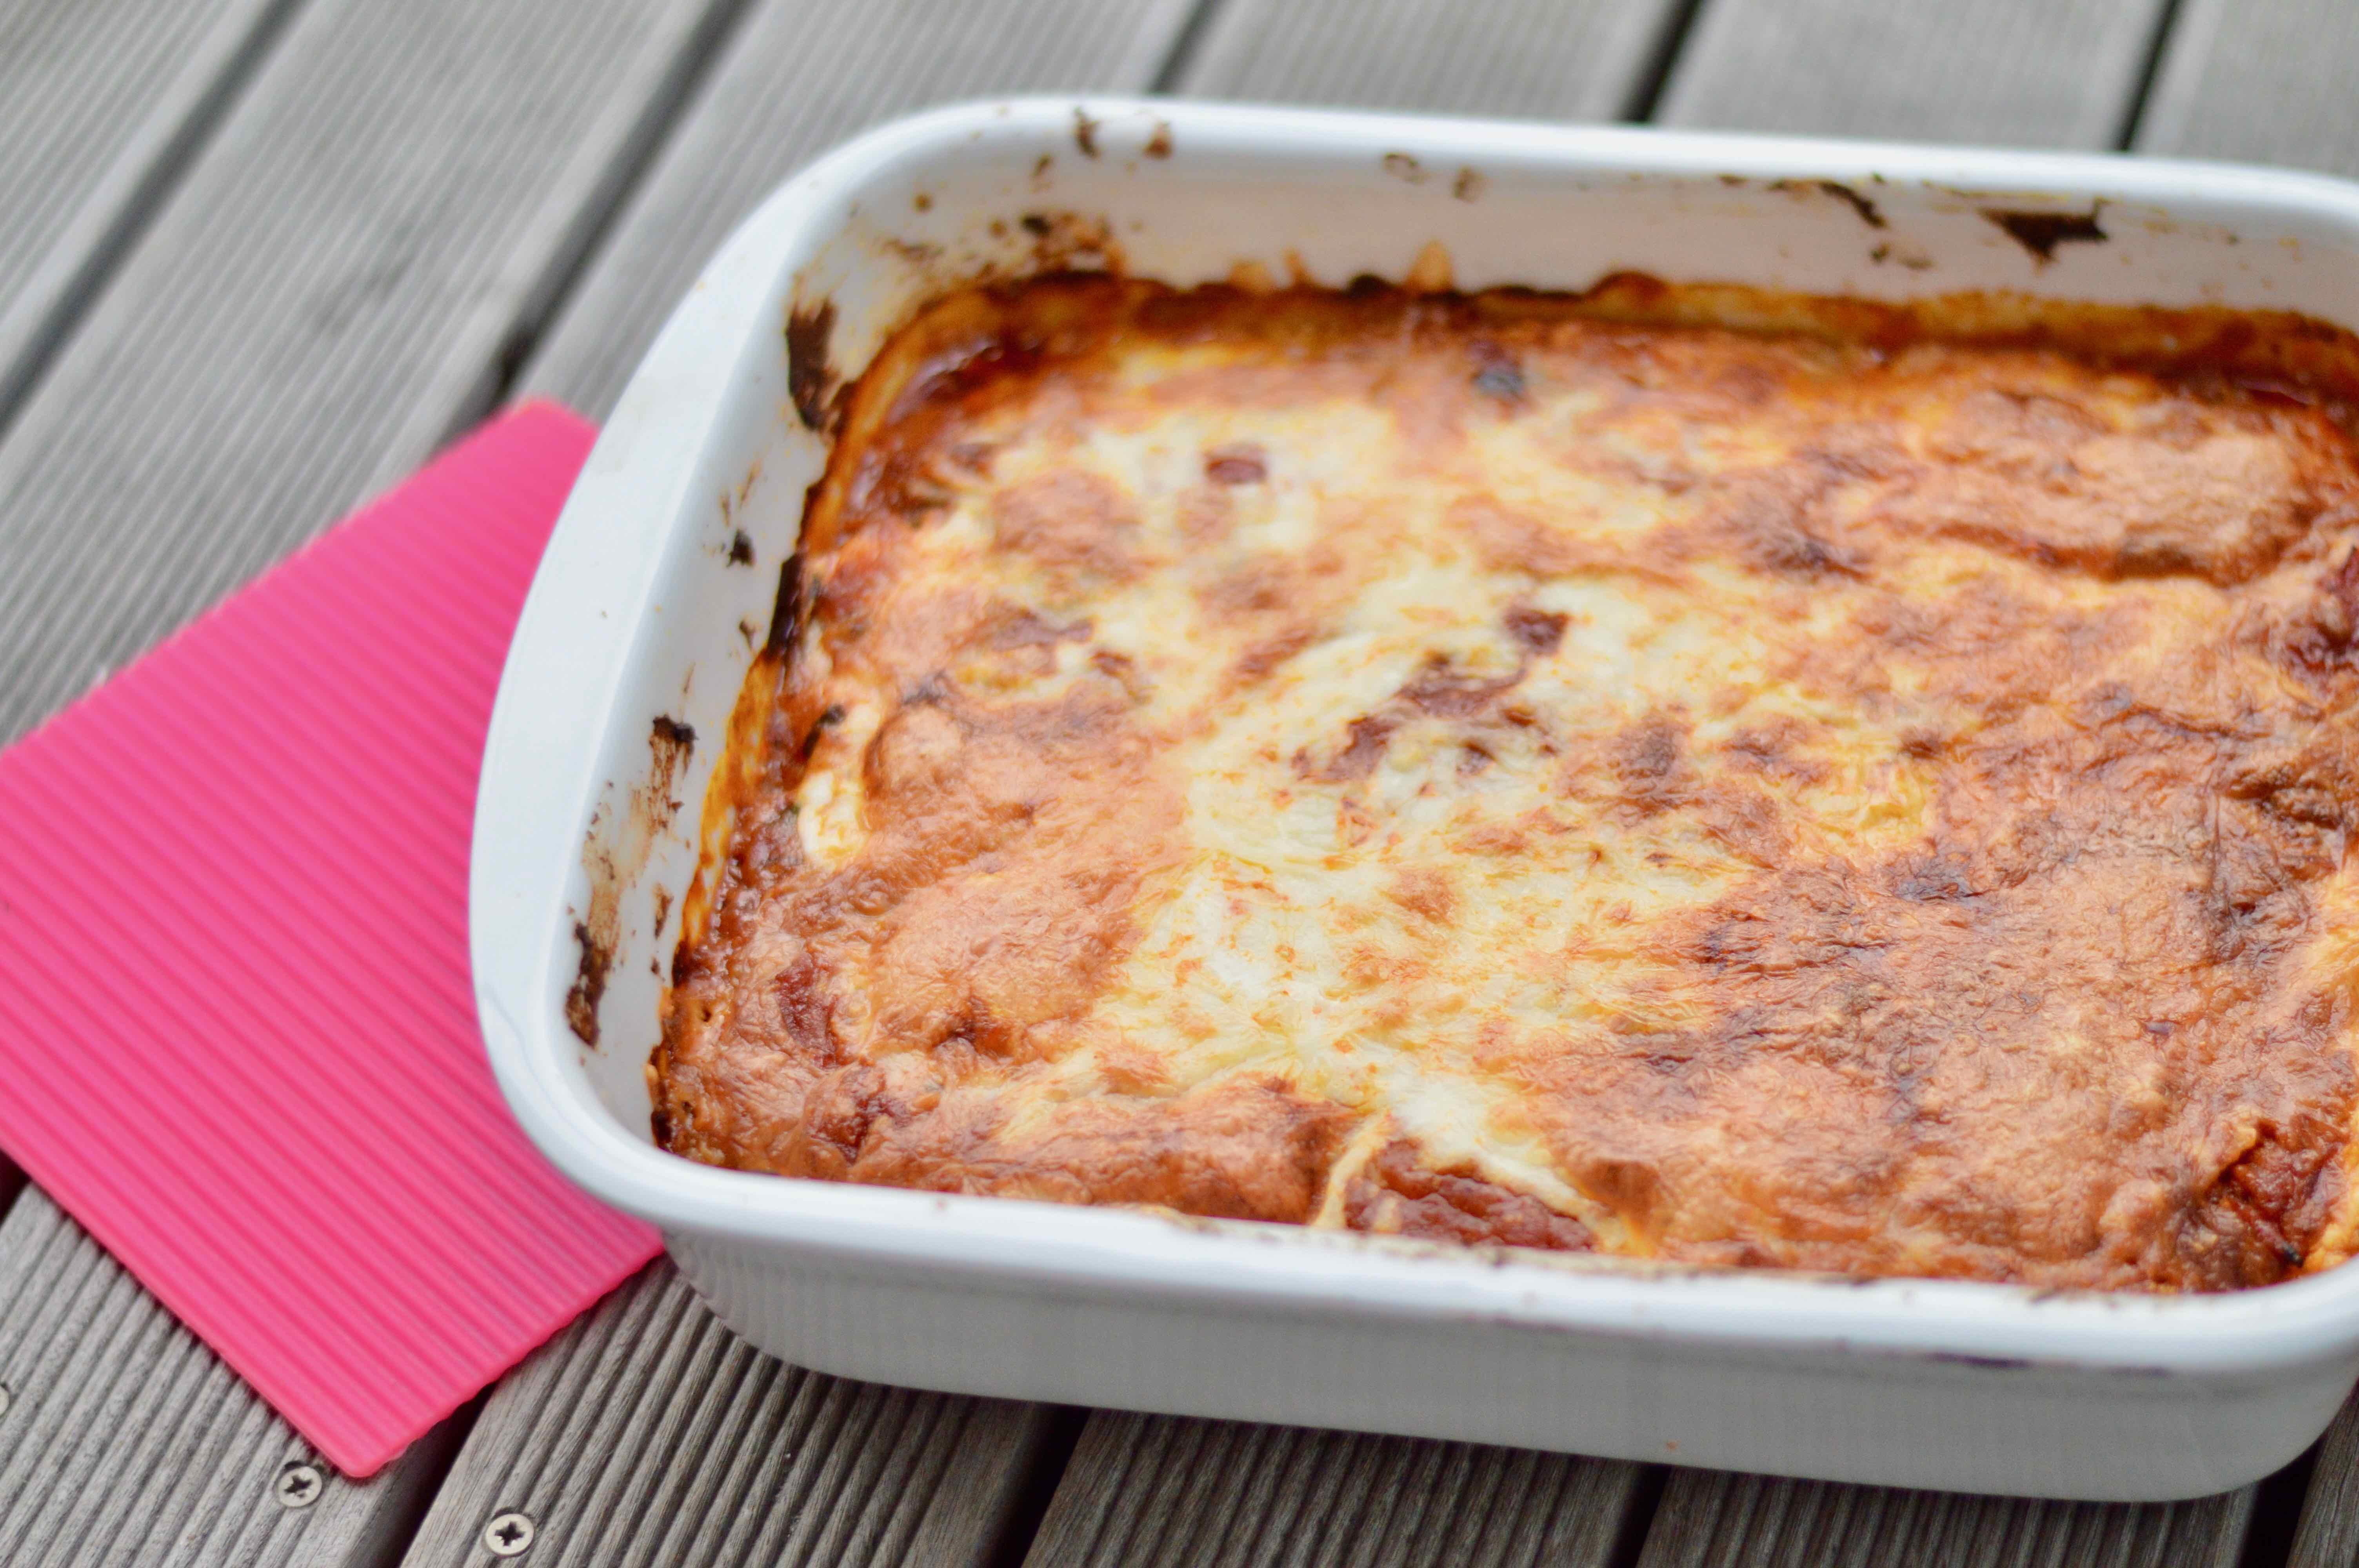 Aubergine Eggplant Bake